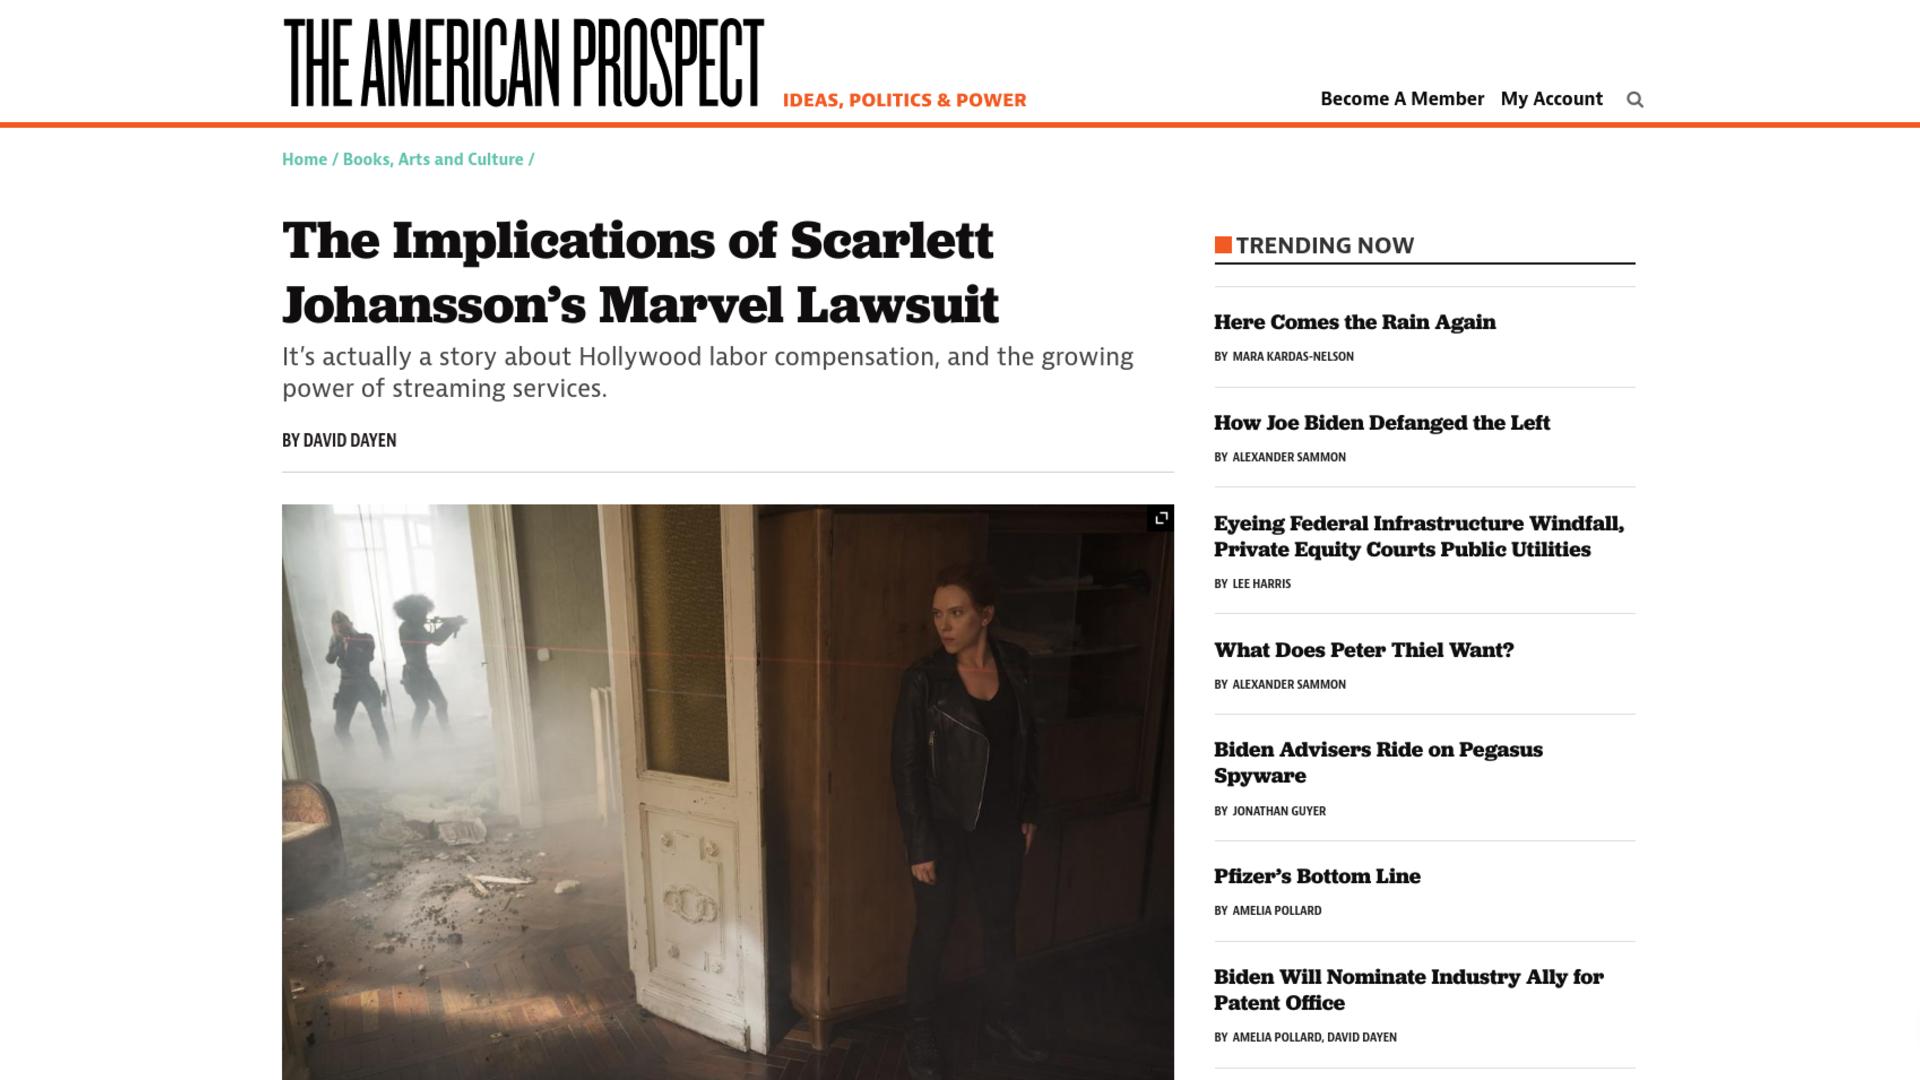 Fairness Rocks News The Implications of Scarlett Johansson's Marvel Lawsuit